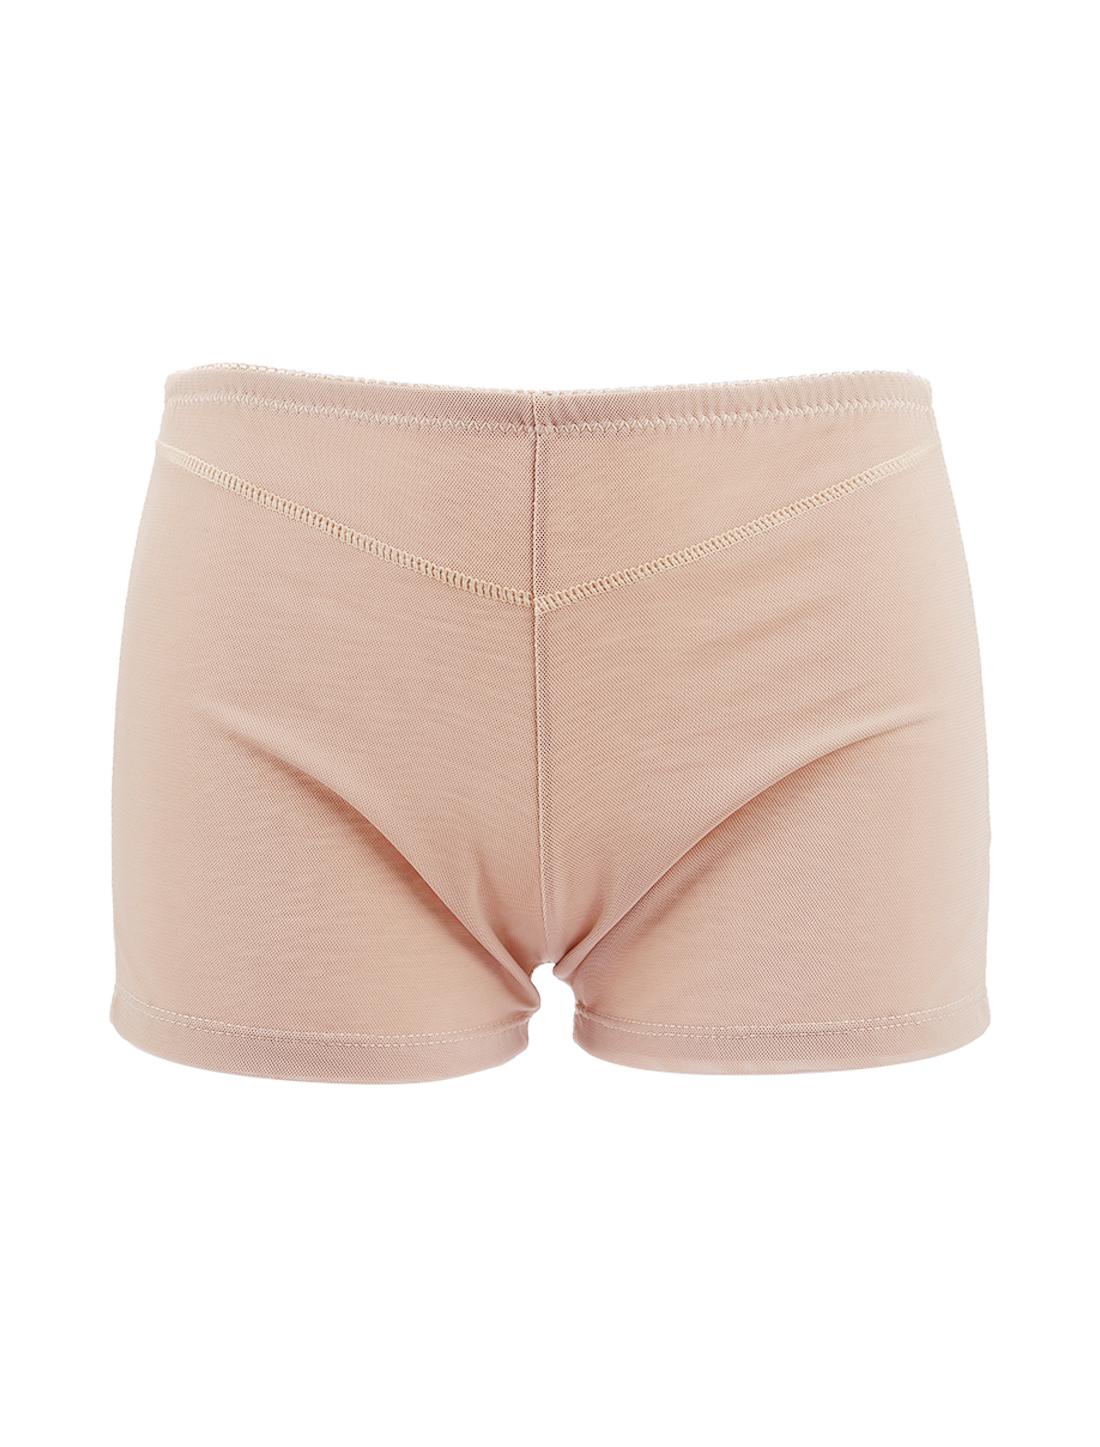 Women Butt Lifter Tummy Control Shapewear Enhancer Boyshort Underwear Beige XX-Large